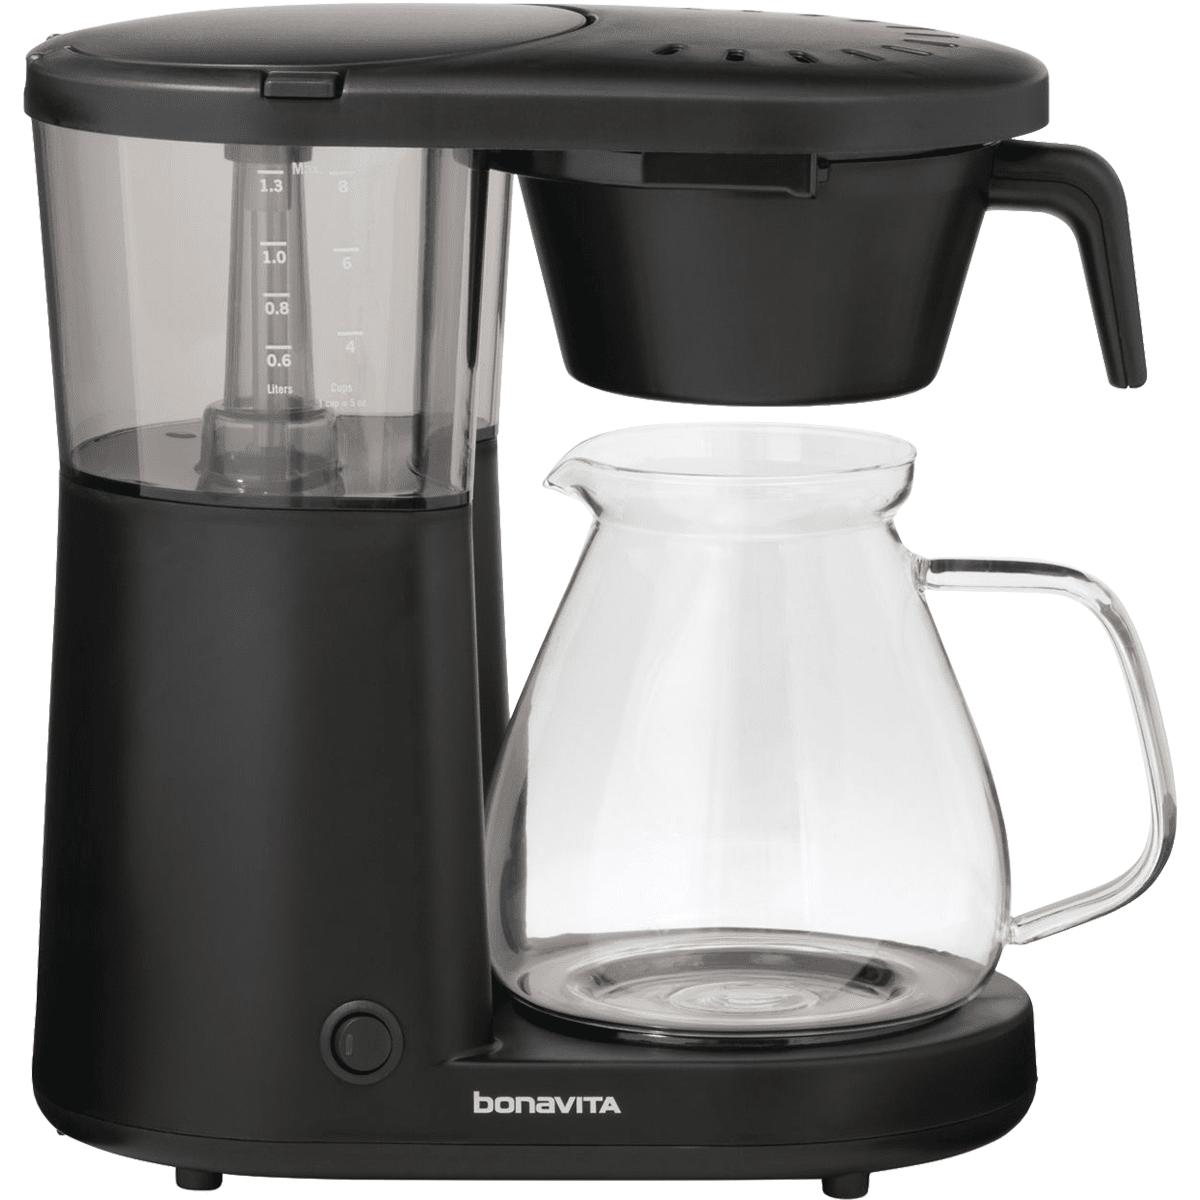 Bonavita Metropolitan One-Touch Coffee Maker